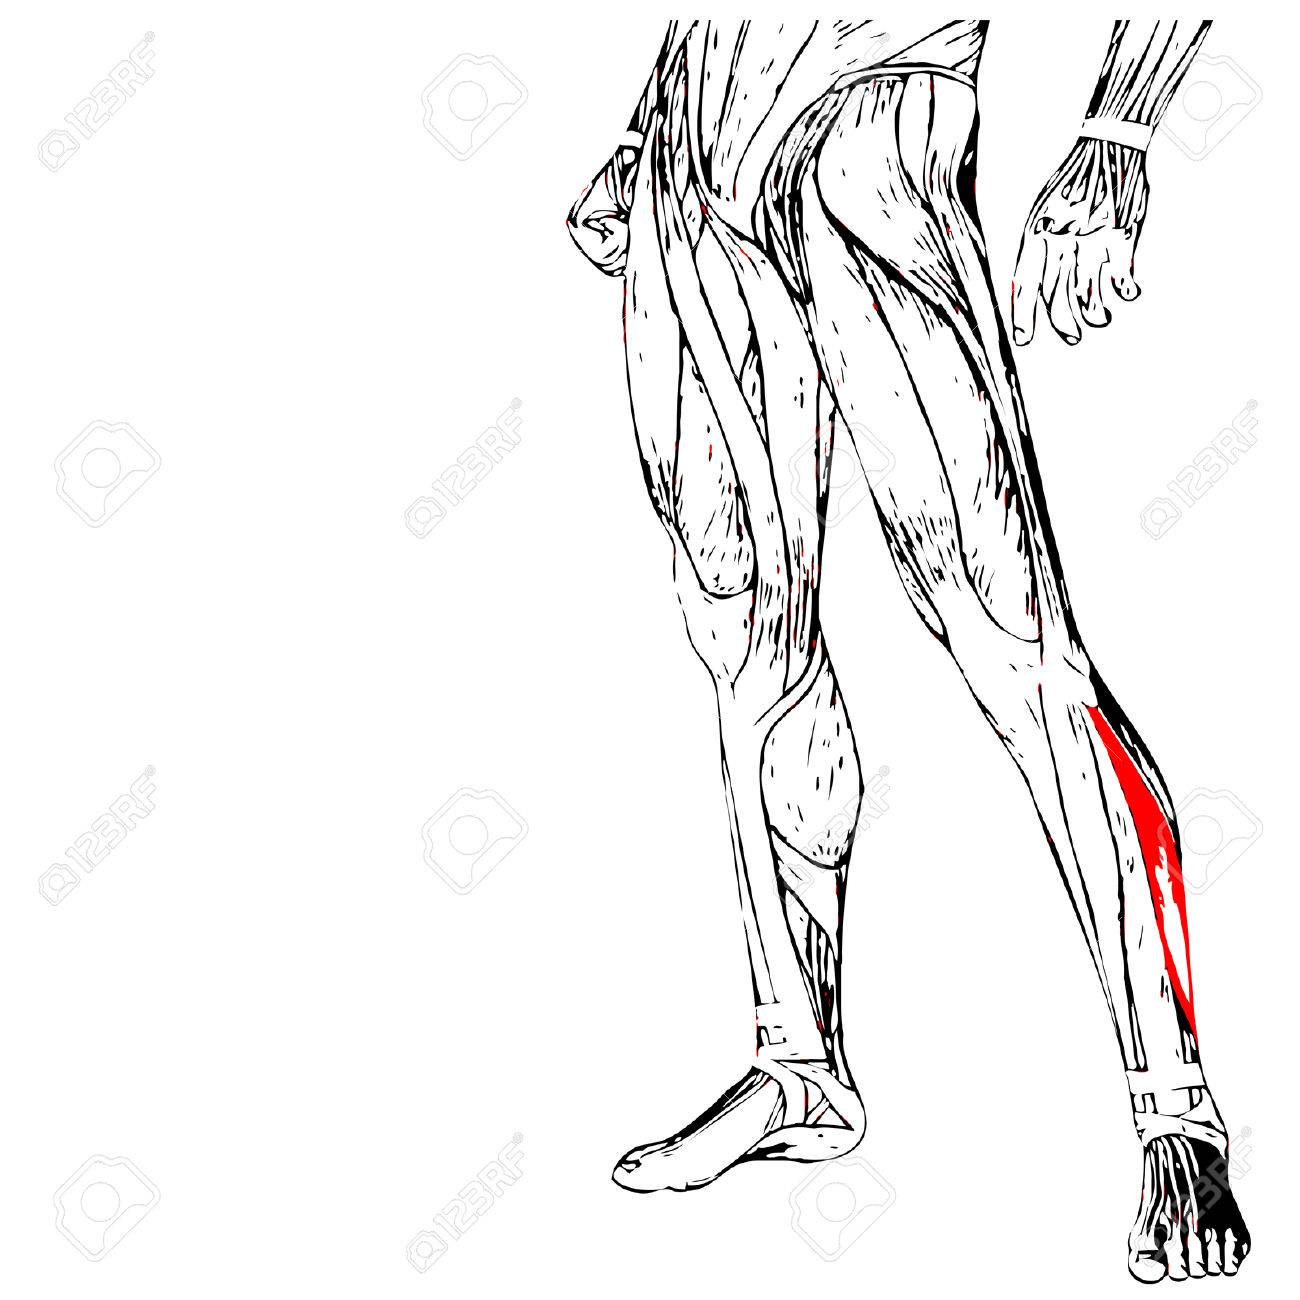 Vector Concept Or Conceptual 3D Human Lower Leg Anatomy Or ...